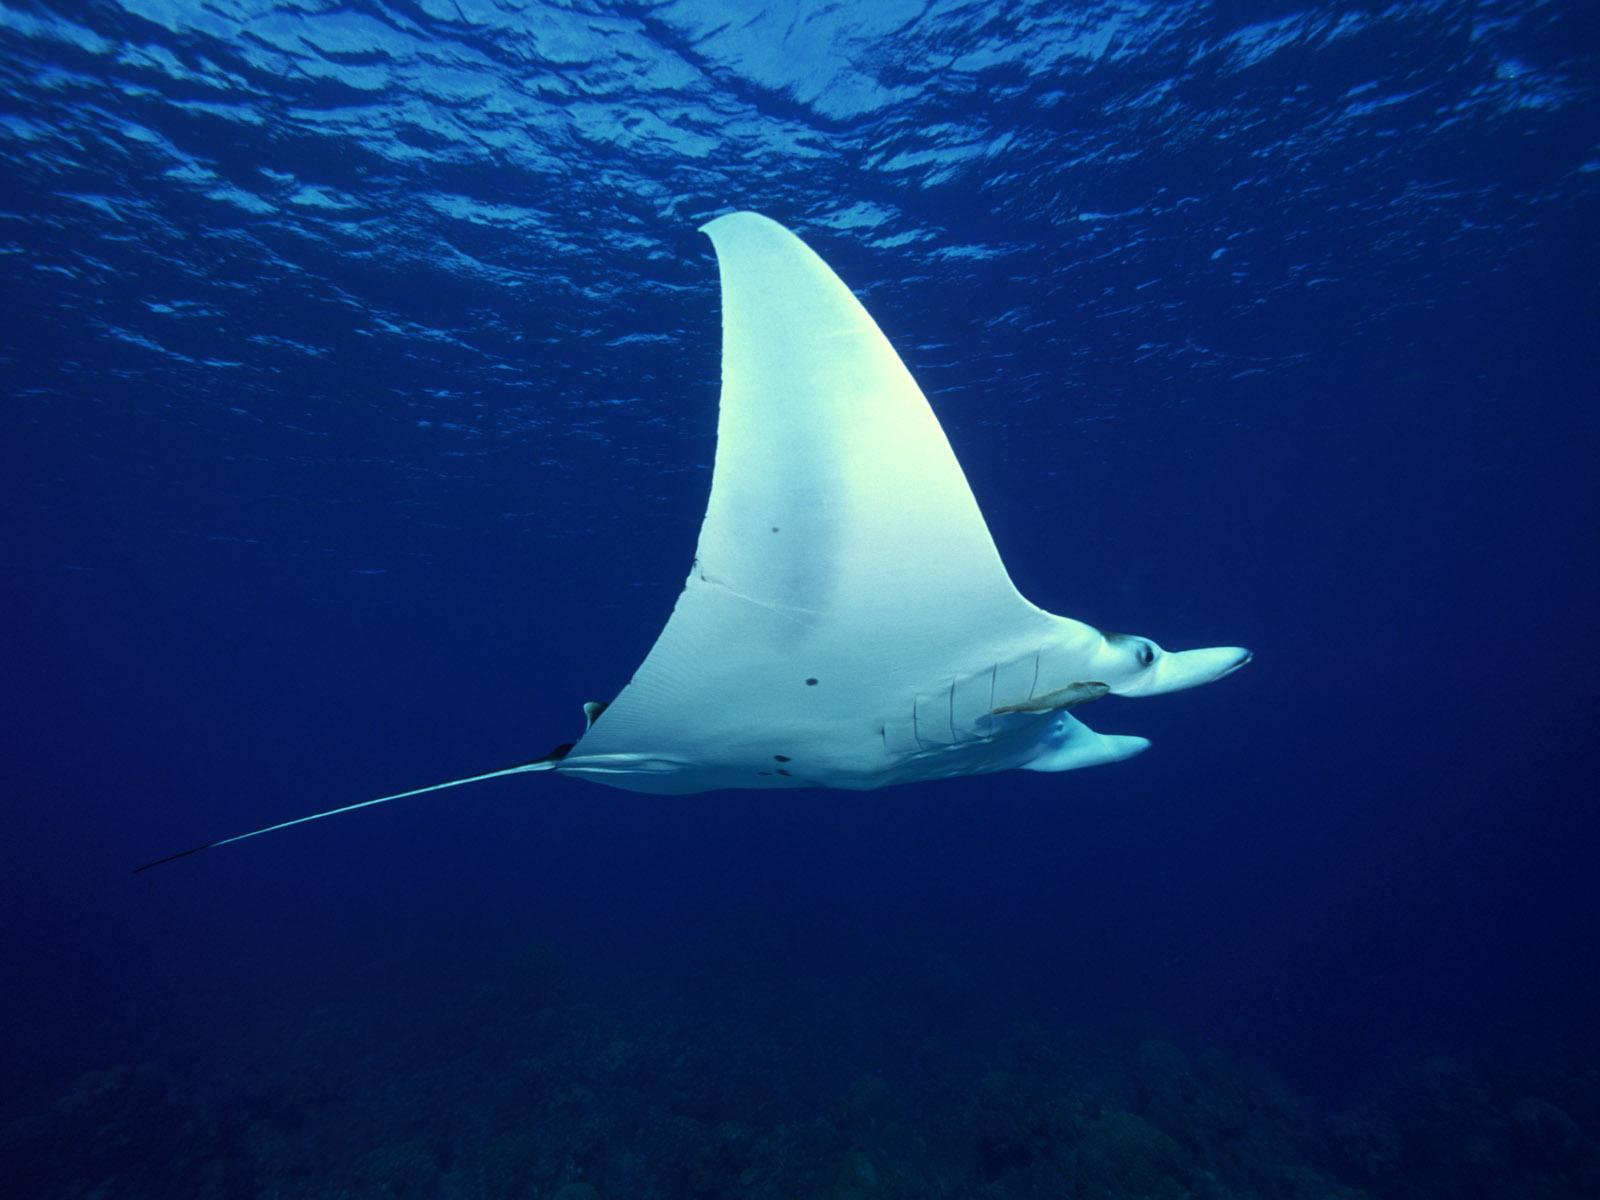 https://2.bp.blogspot.com/-4t3qPwzMlWE/TkrZBmSC5lI/AAAAAAAALmg/9pDSTIvPRCM/s1600/Underwater%2BWallpapers%2B%25252852%252529.jpg